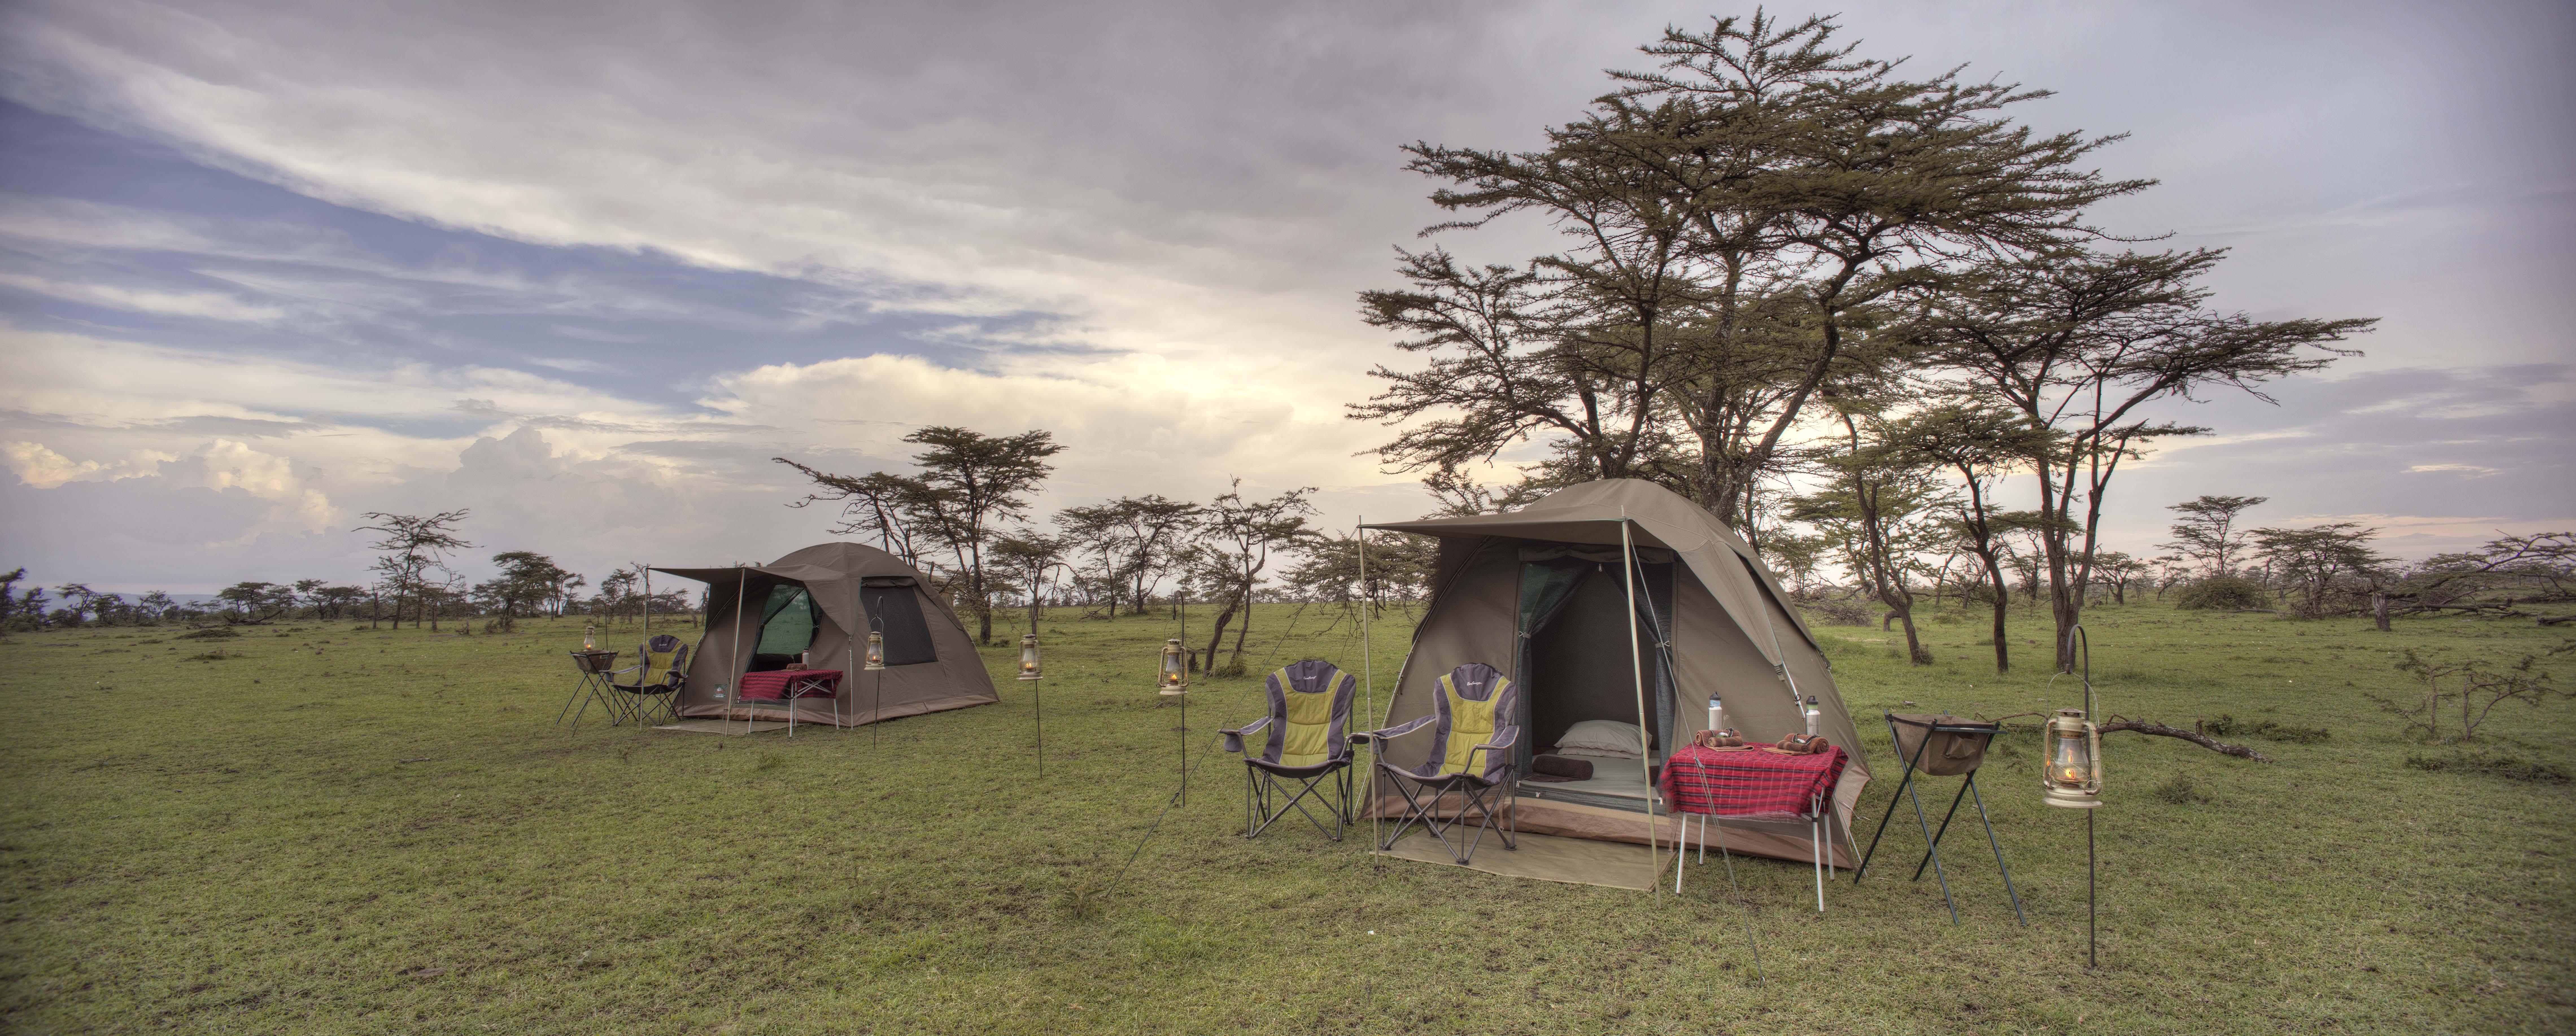 Naboisho-Camp-fly-camping-Stevie-Mann-MR